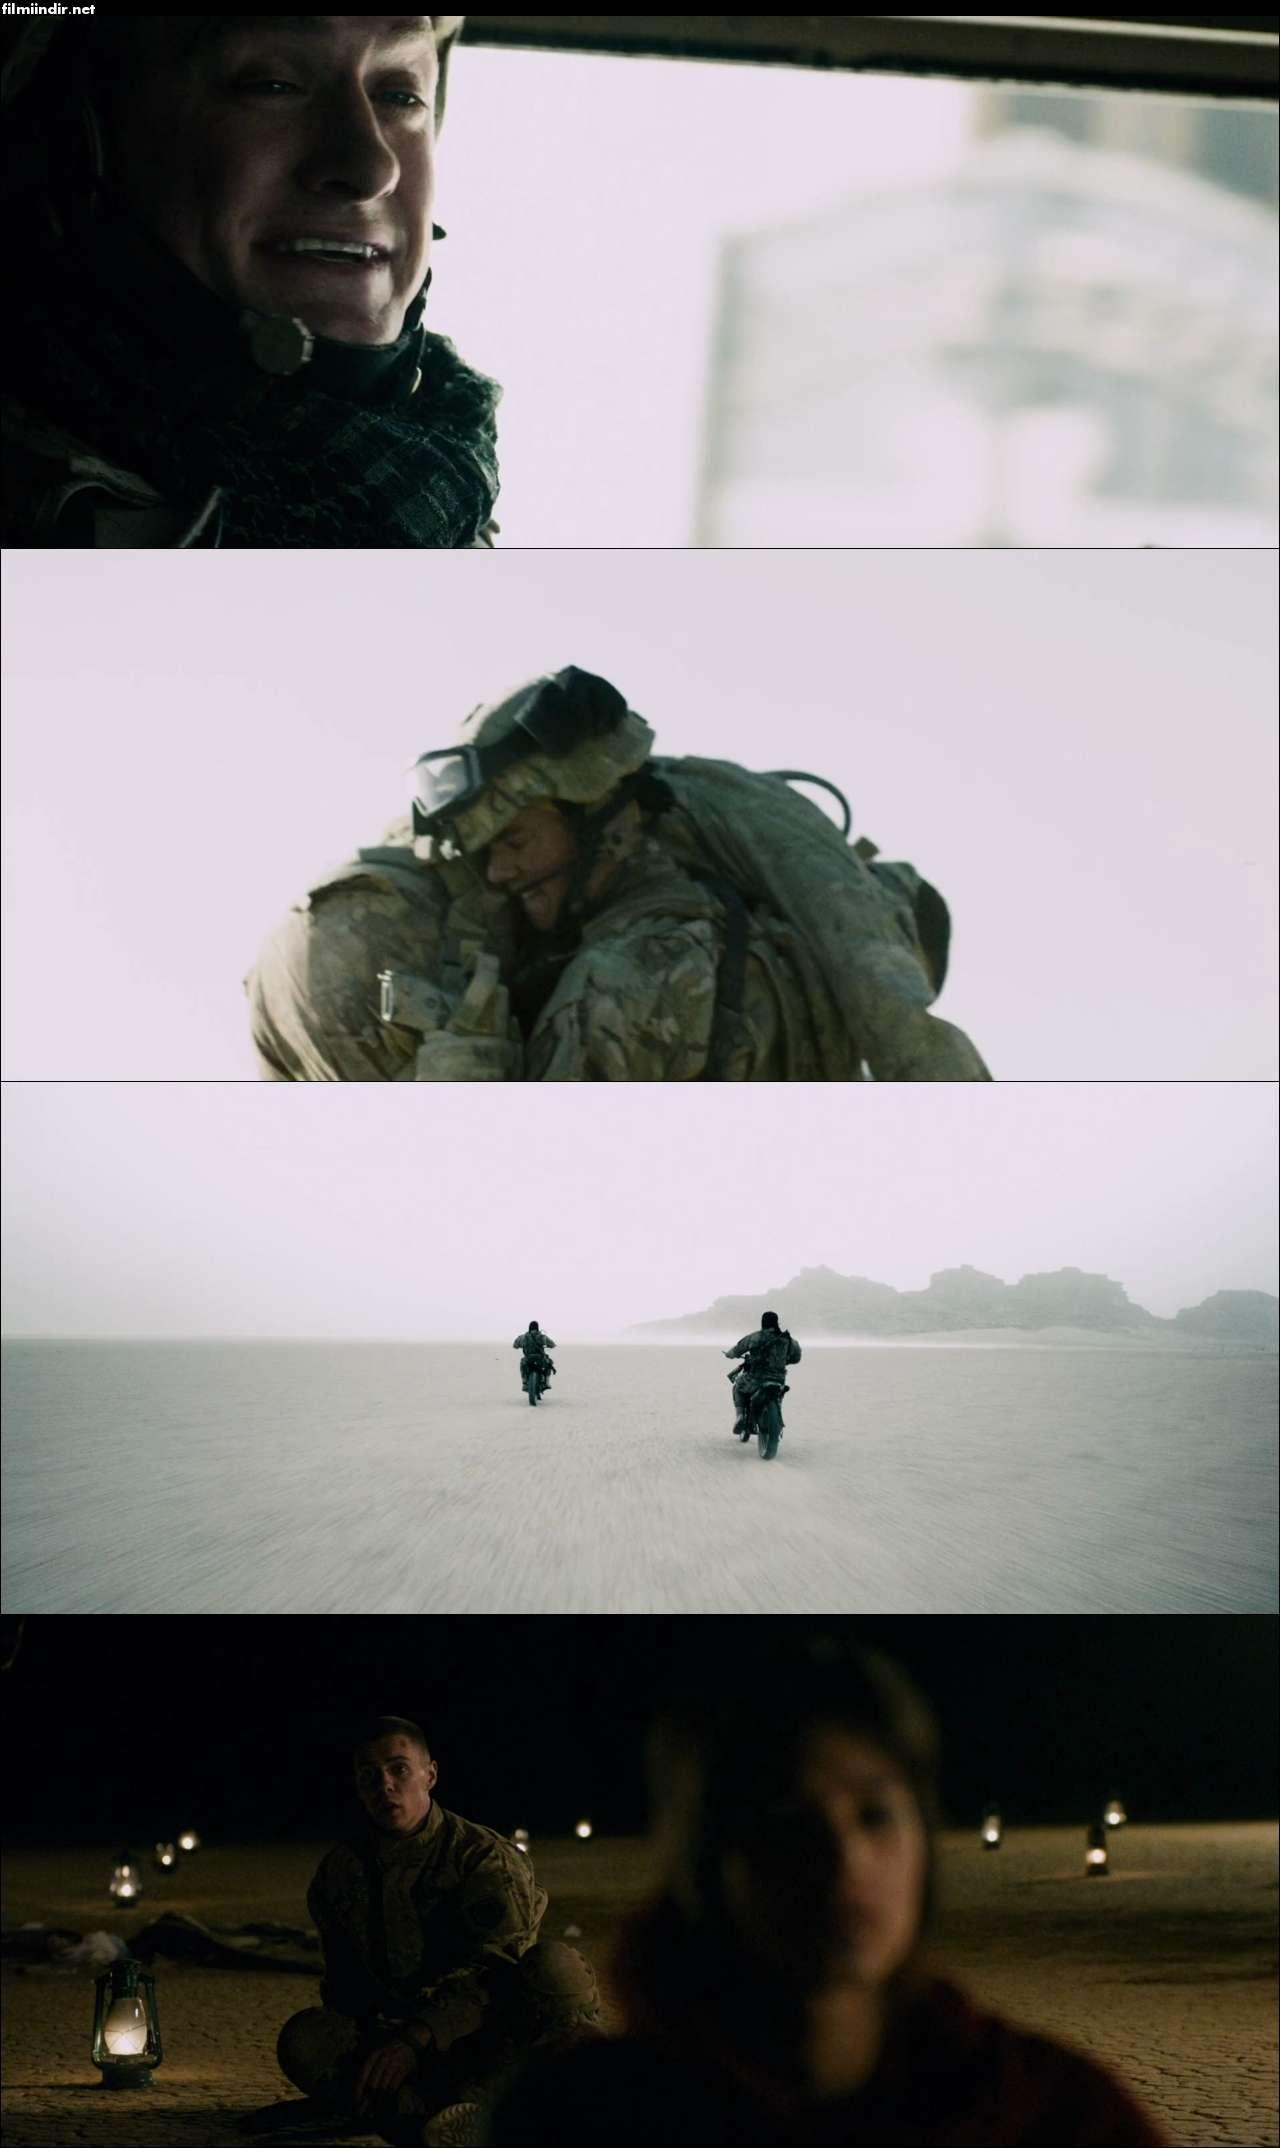 İstila Karanlık Kıta - Monsters: Dark Continent (2014) hd türkçe dublaj film indir